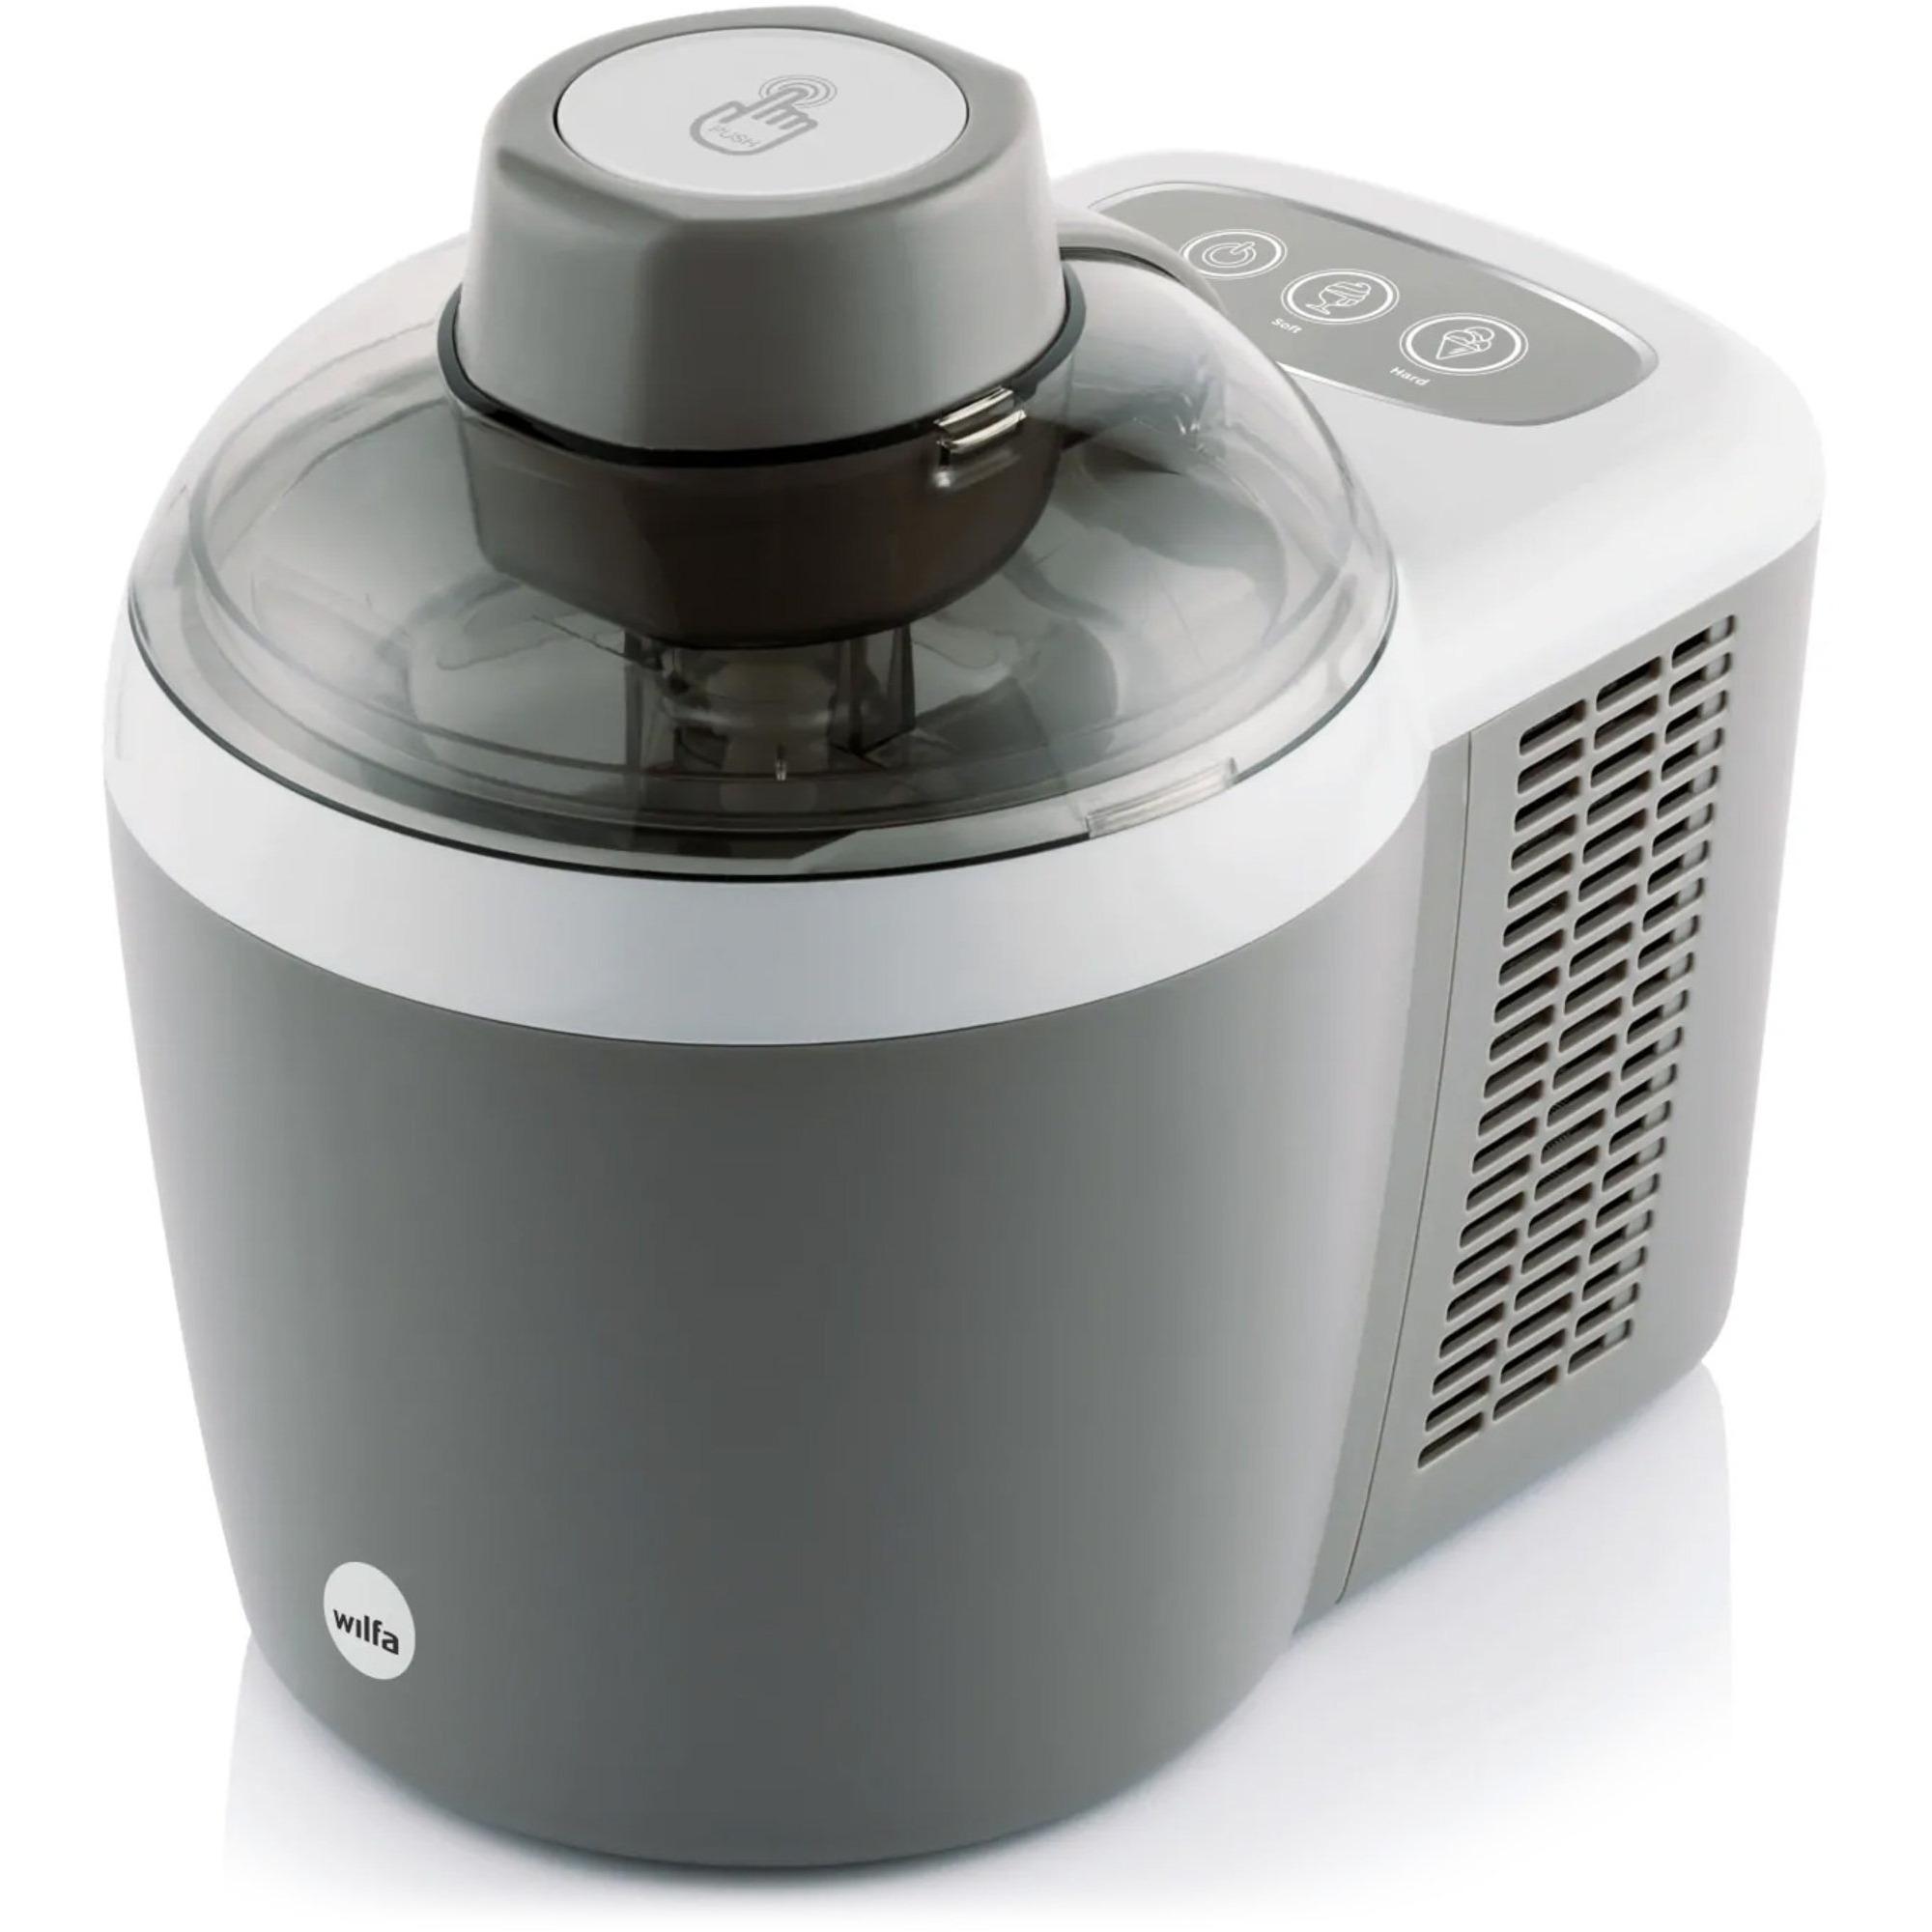 Wilfa Glassmaskin ICMT-700SI